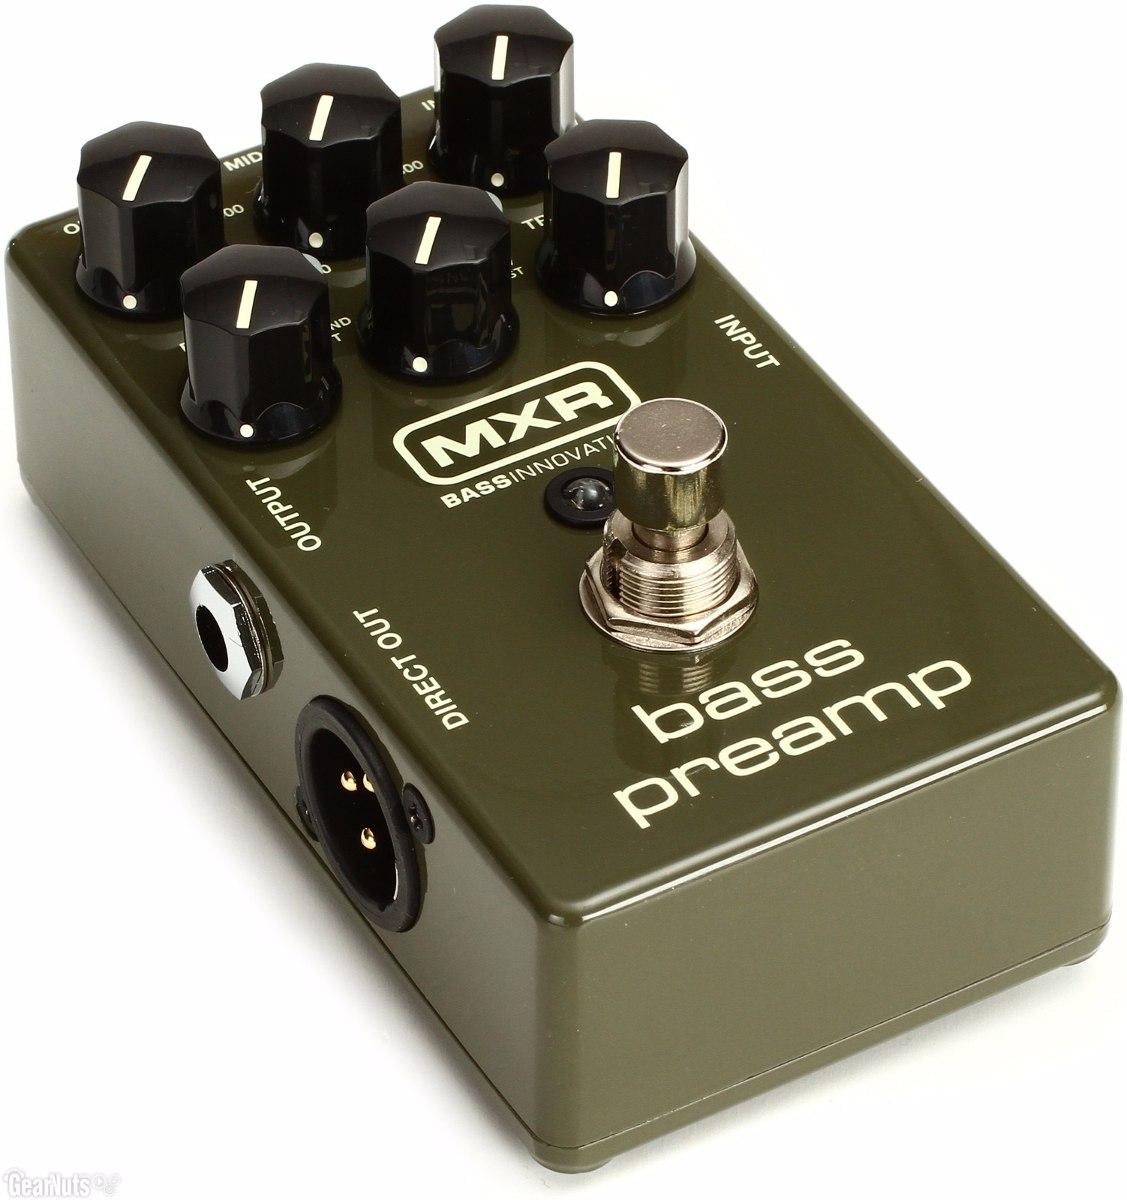 Pedal De Efecto Para Bajo Mxr M81 Bass Preamp - Grey Music